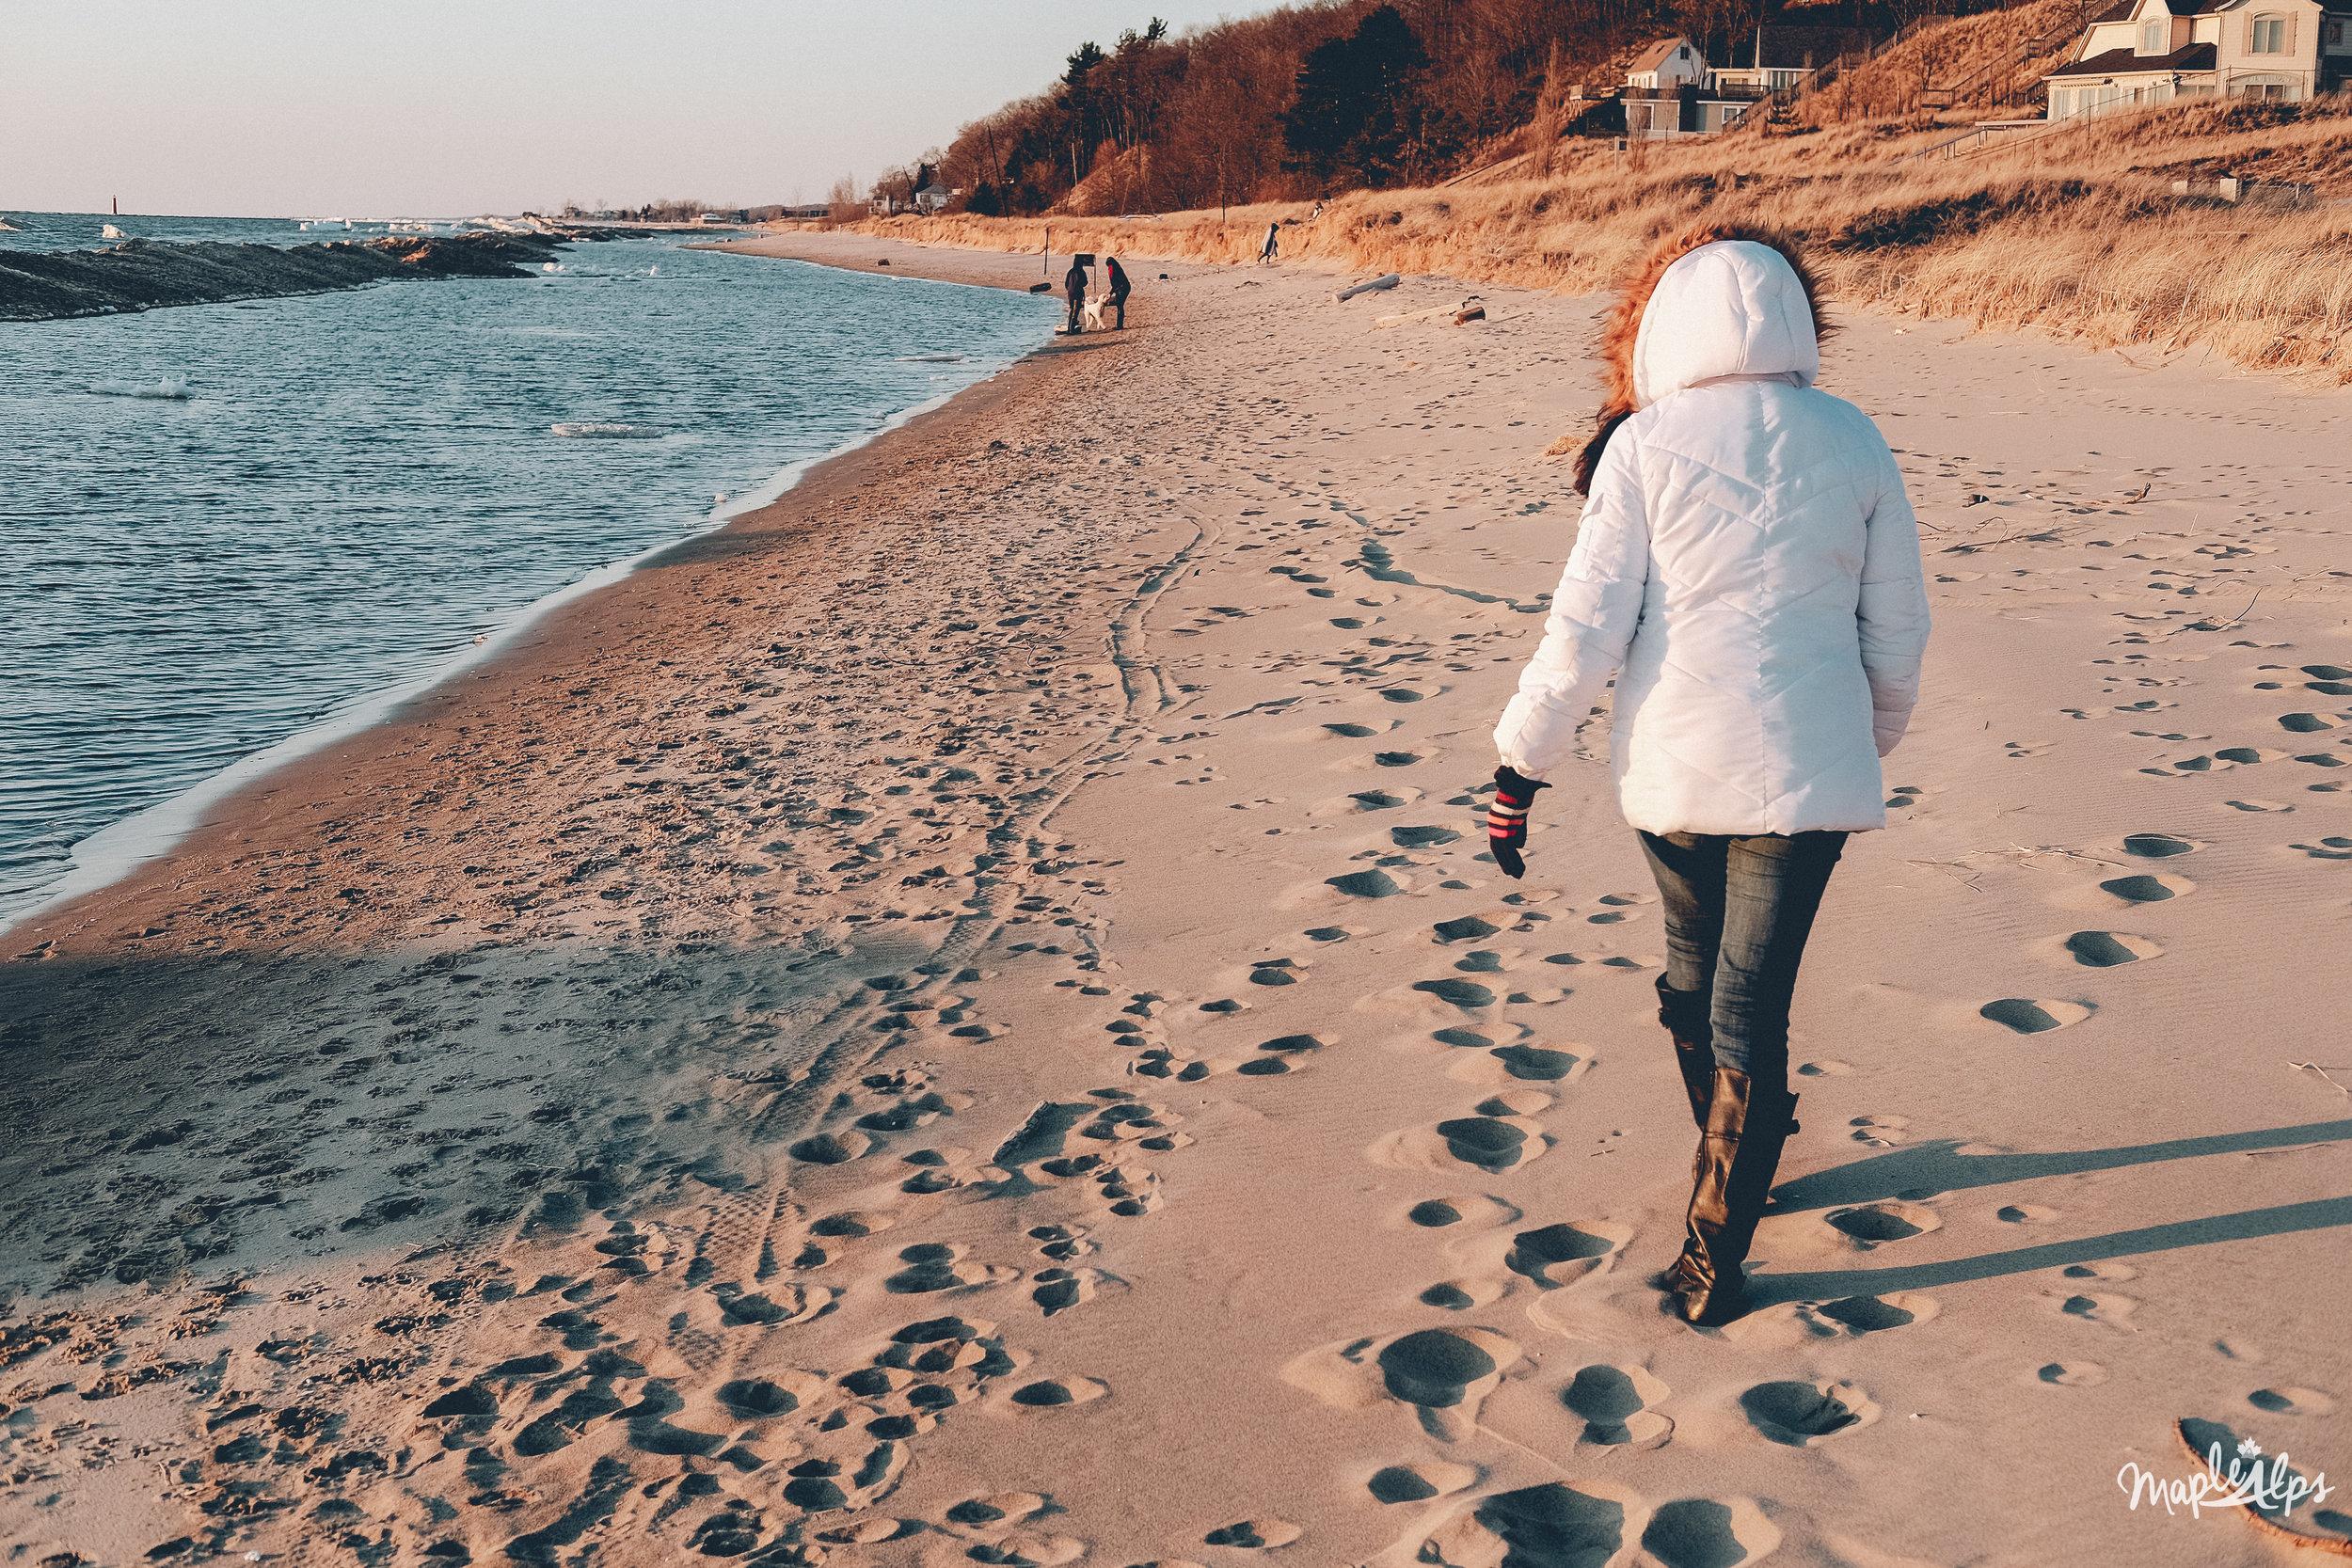 Lake Michigan | www.maplealps.com